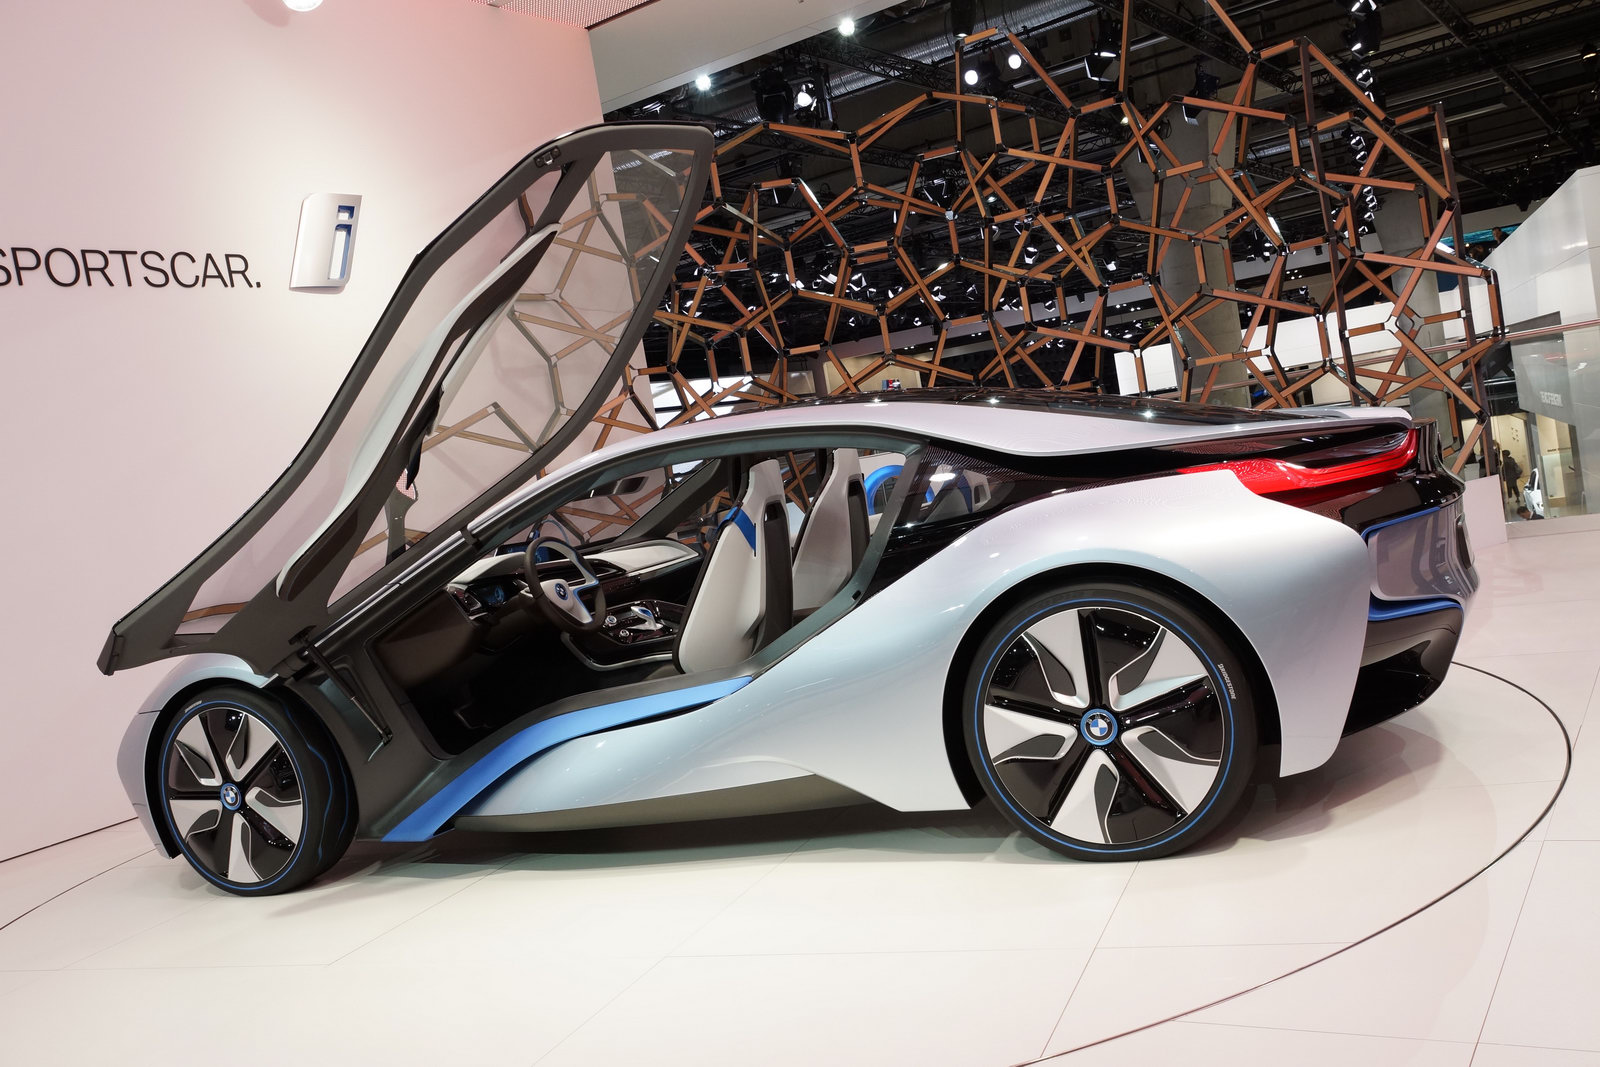 http://3.bp.blogspot.com/-I5kOqUnBBNk/TuDTLFzDpSI/AAAAAAAABWo/UCHj-hDmZRc/s1600/2013-BMW-i8-99.jpg